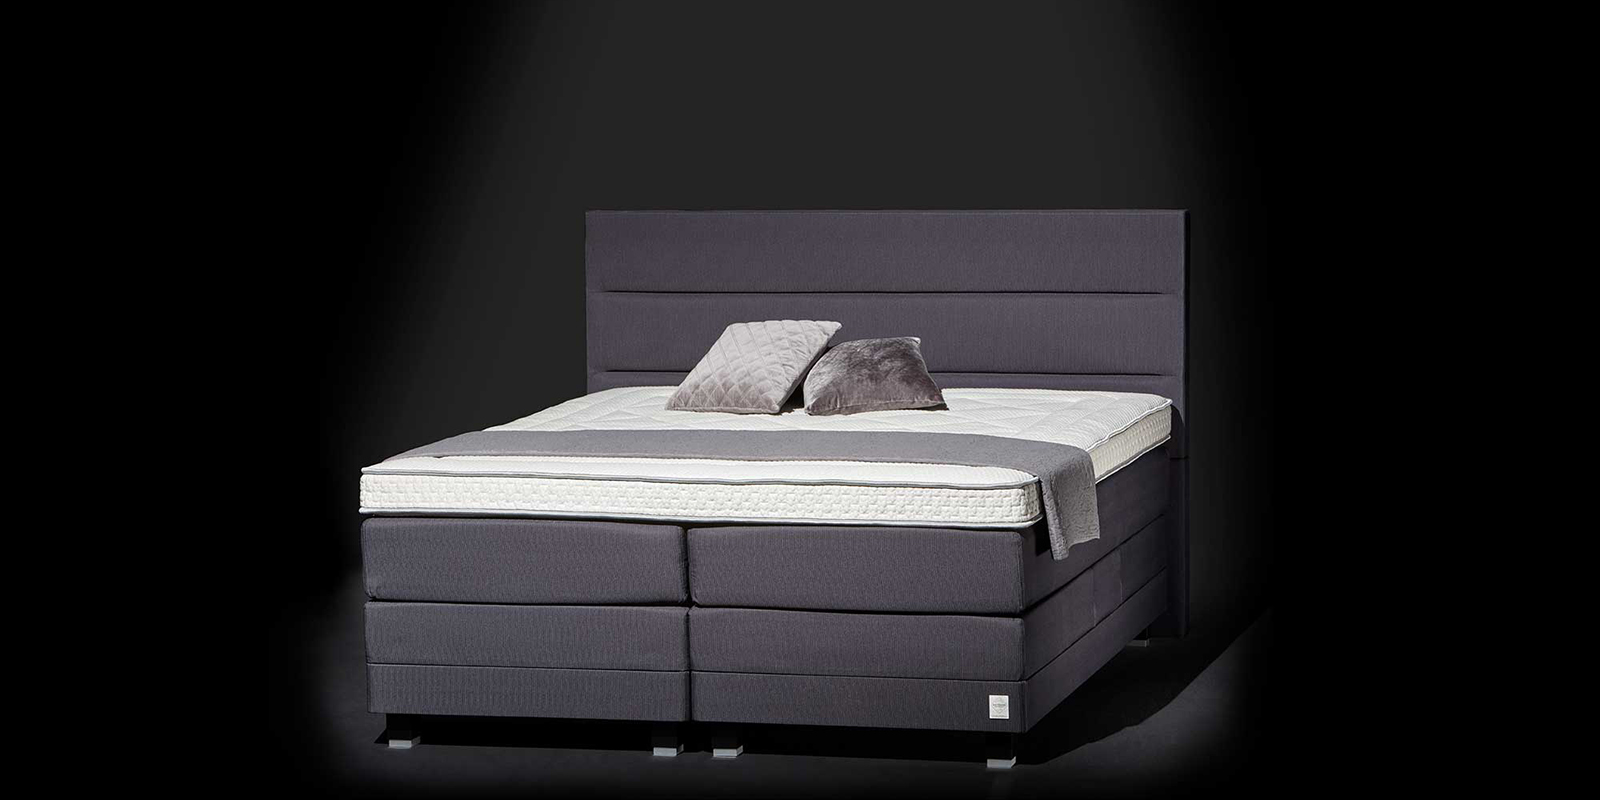 Swiss Sense, boxspring, bedspecialist, bedden, luxe slaapkamer, exclusieve bedden